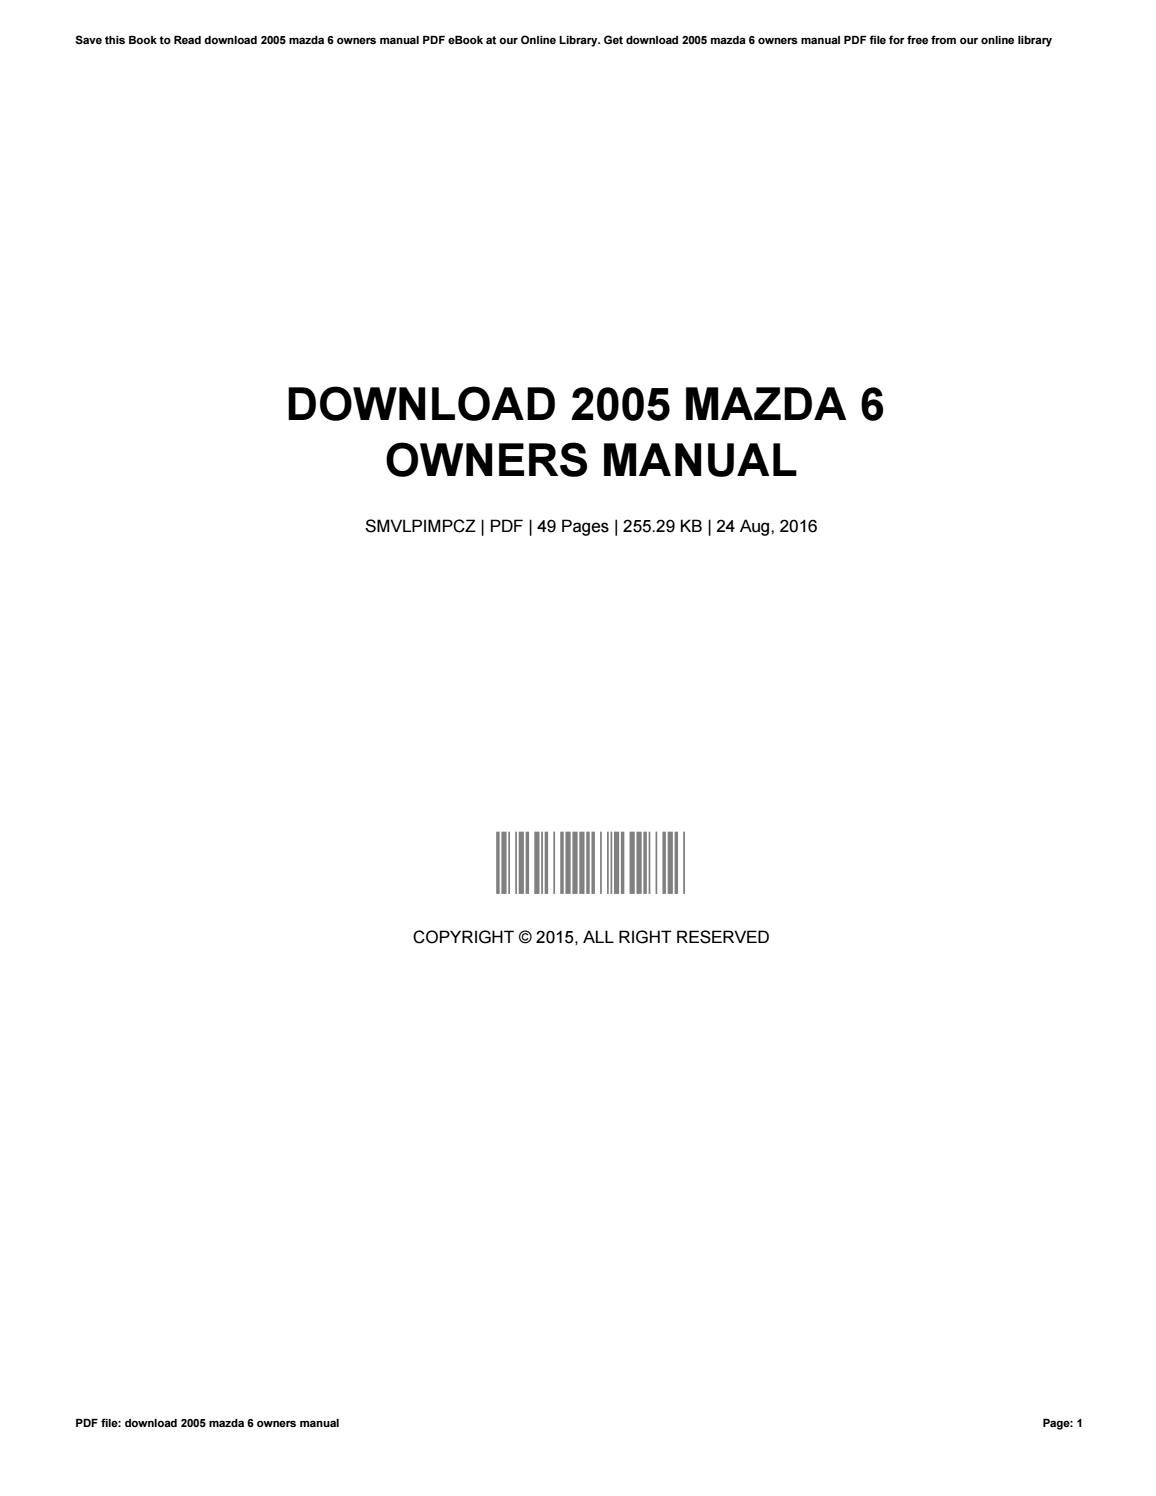 hitachi 43fdx15b 43fdx20b 53fdx20b 53sdx20b addendum service manual